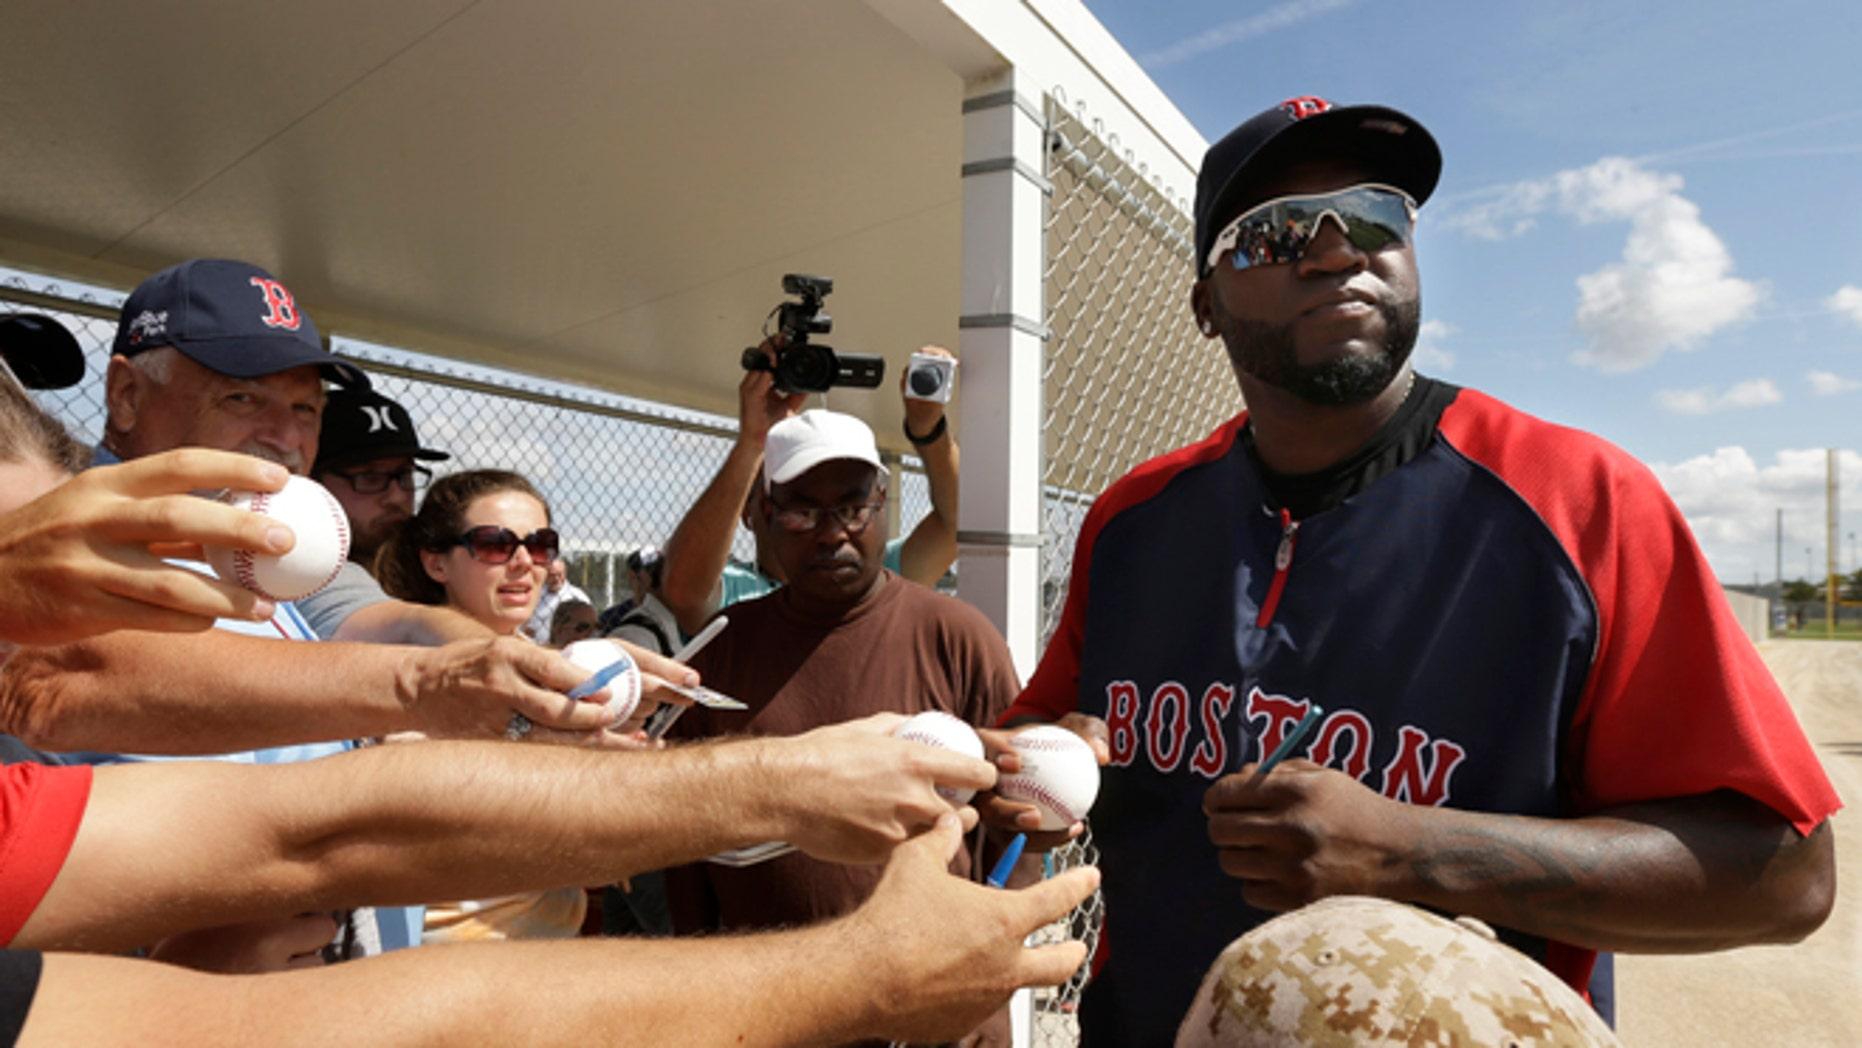 Boston Red Sox designated hitter David Ortiz signs autographs during spring training baseball practice, Sunday, Feb. 23, 2014, in Fort Myers, Fla. (AP Photo/Steven Senne)